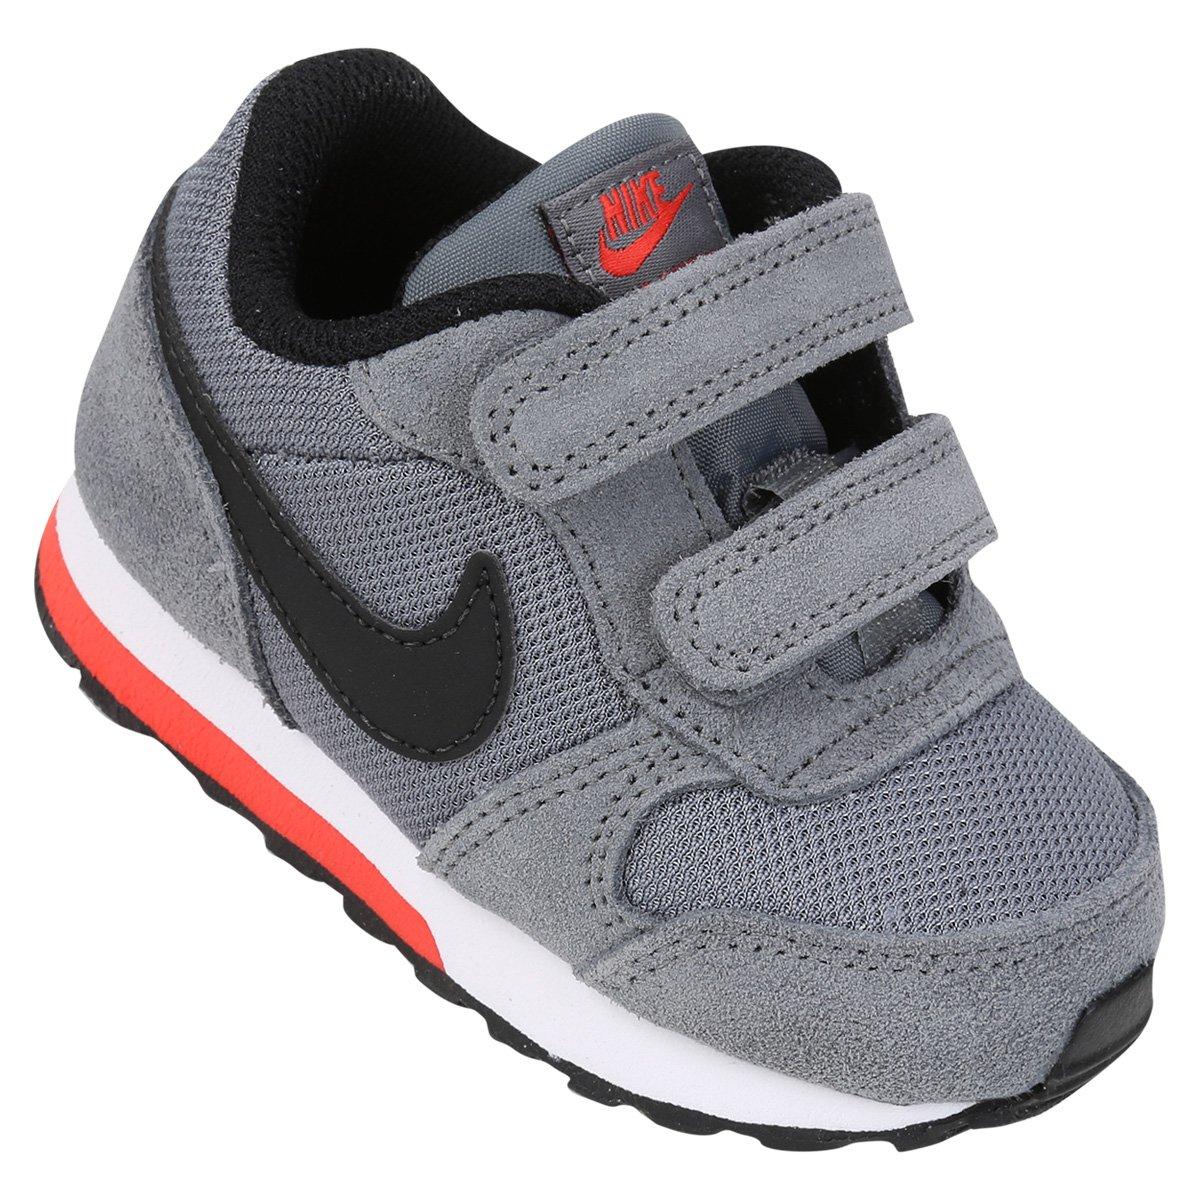 82cfd9c2f27 Tênis Infantil Nike Mid Runner 2 - Cinza e Preto - Compre Agora ...